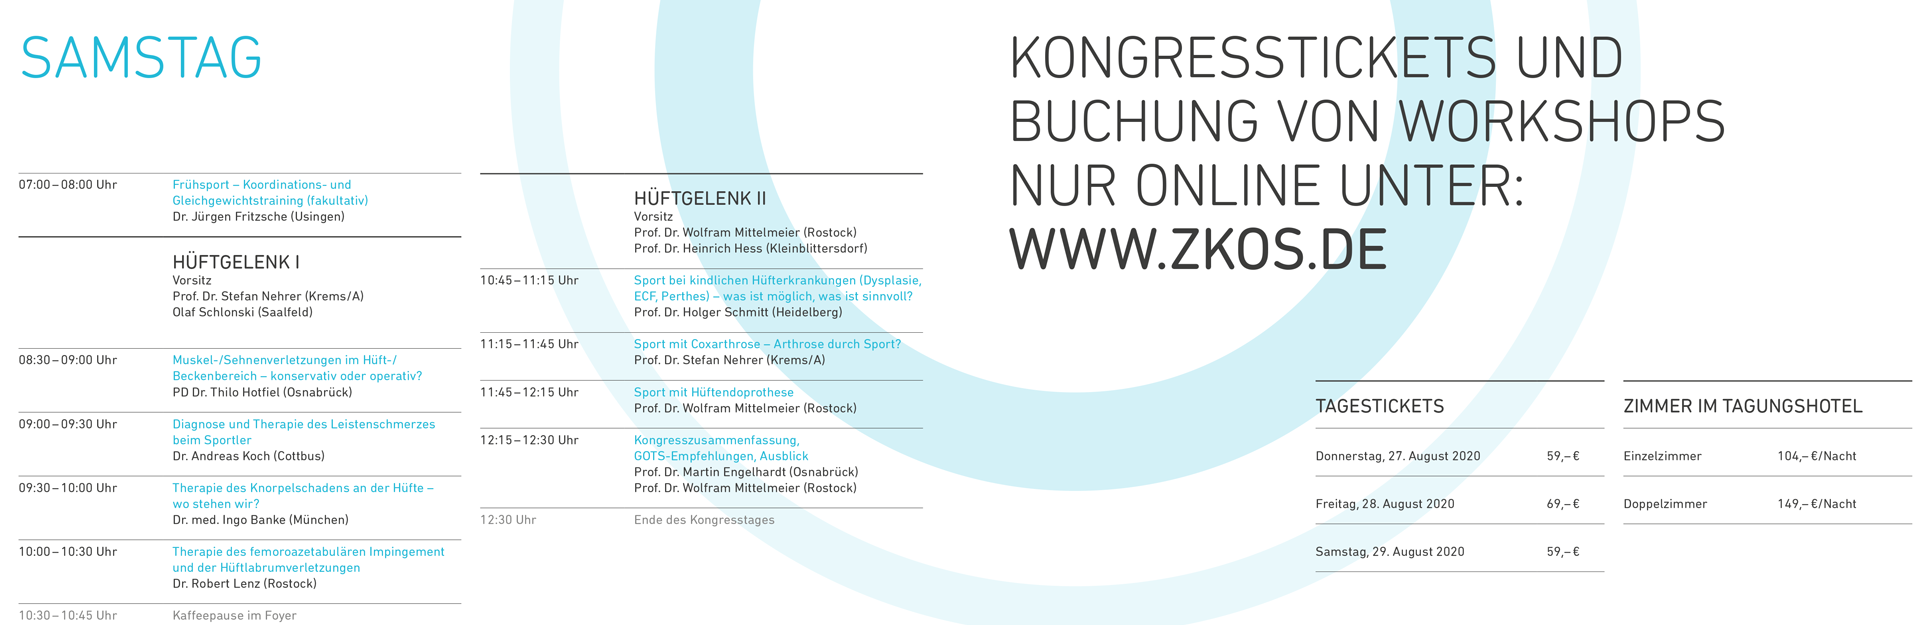 programm-zkos-2020-6